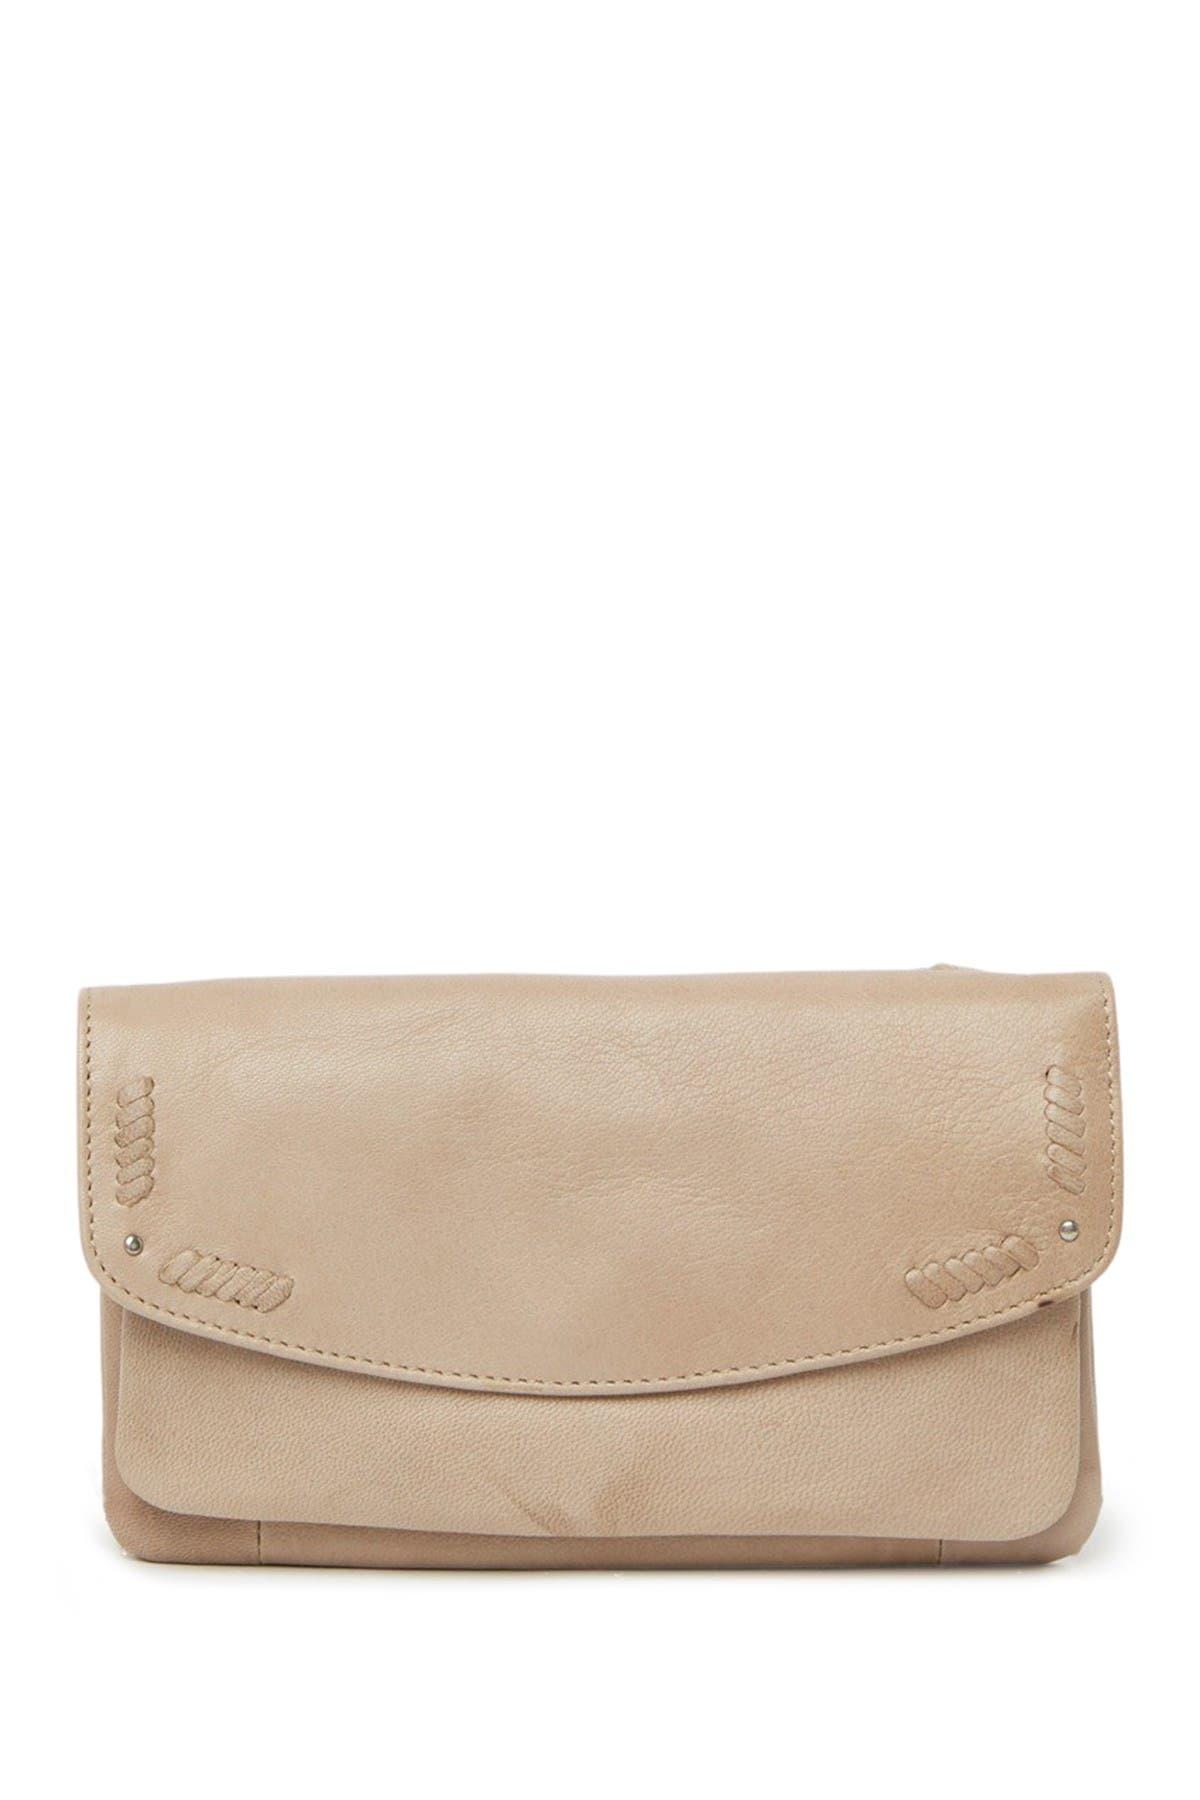 Image of Lucky Brand Kibo Wallet Bag